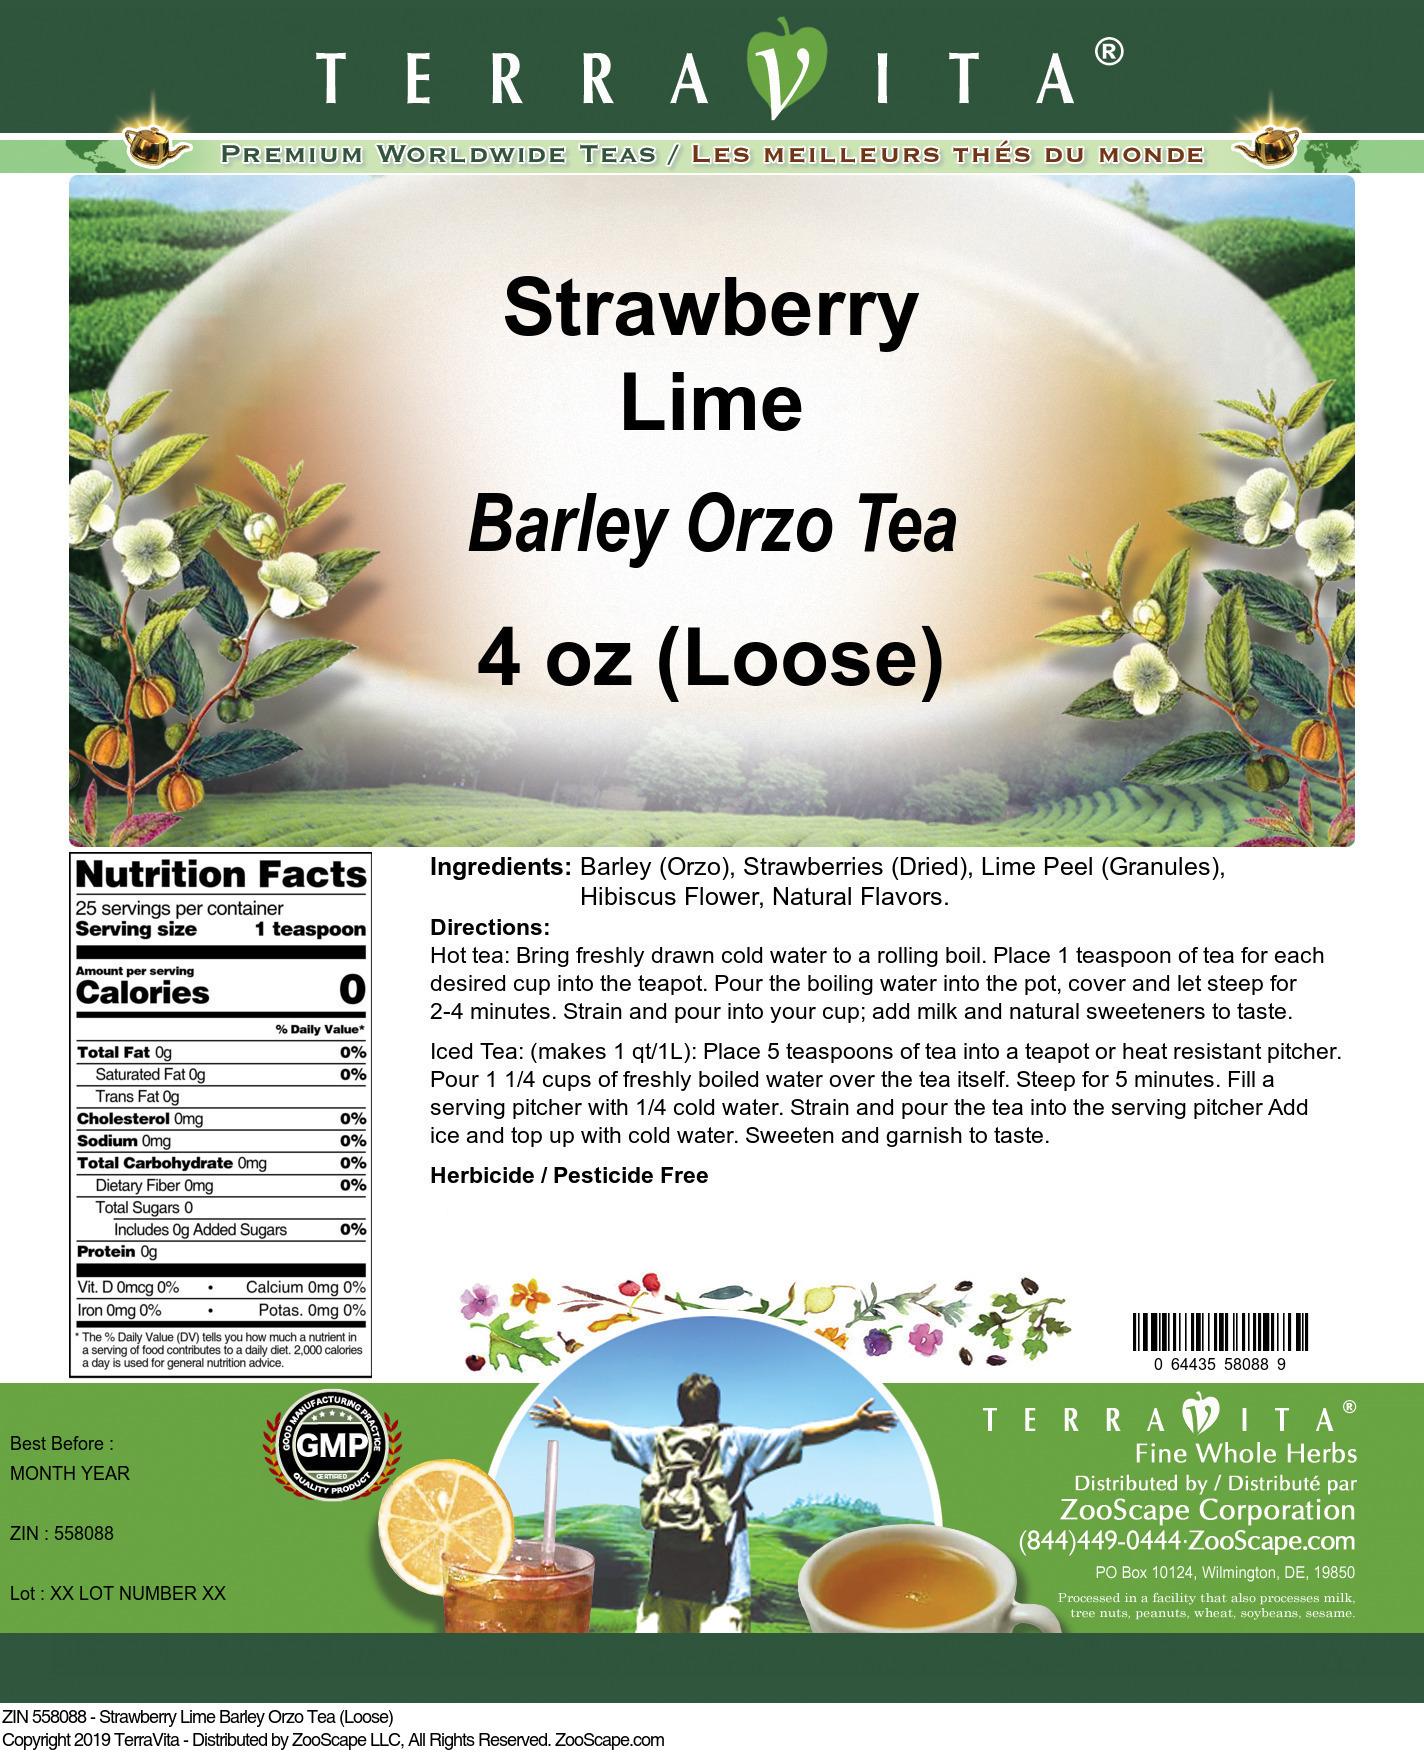 Strawberry Lime Barley Orzo Tea (Loose)